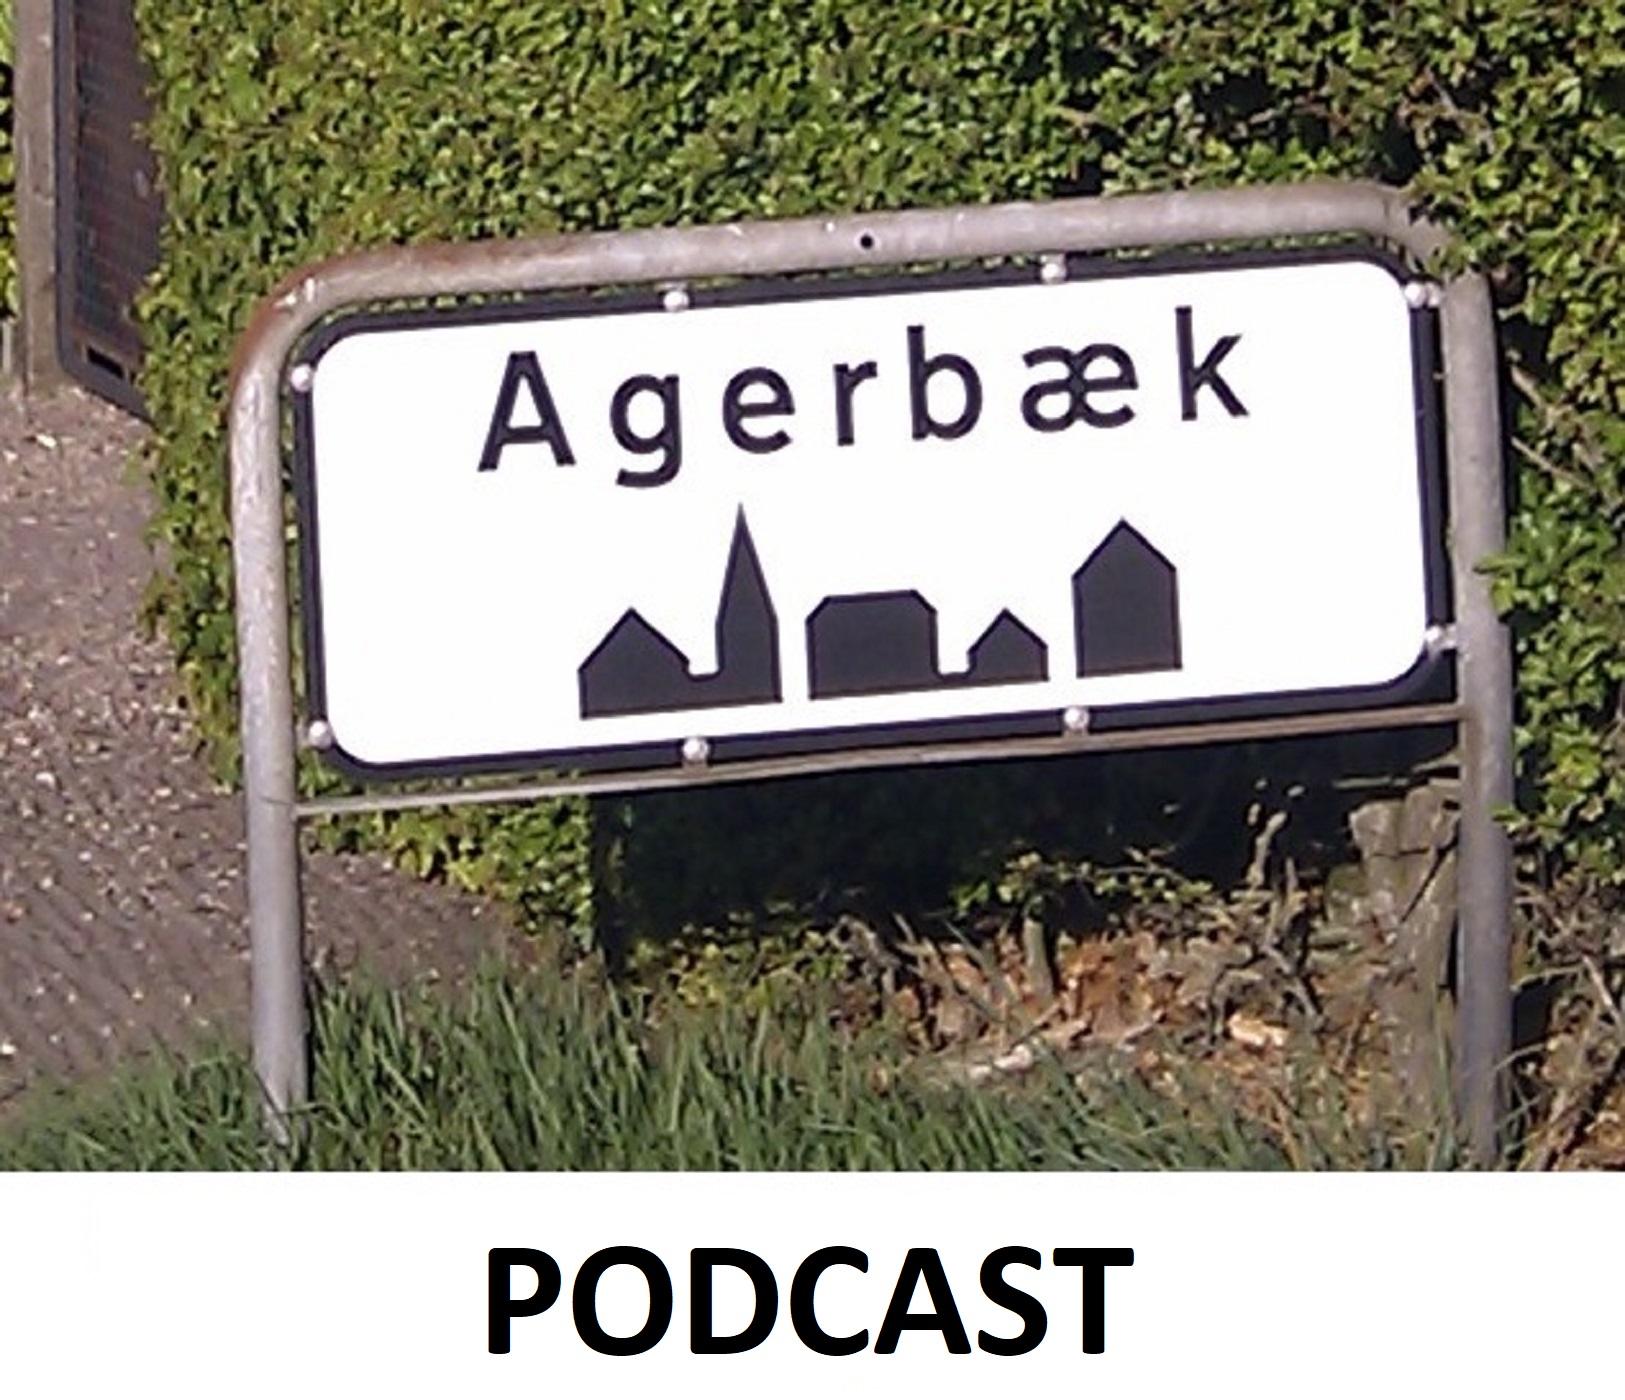 Agerbæk Podcast show art